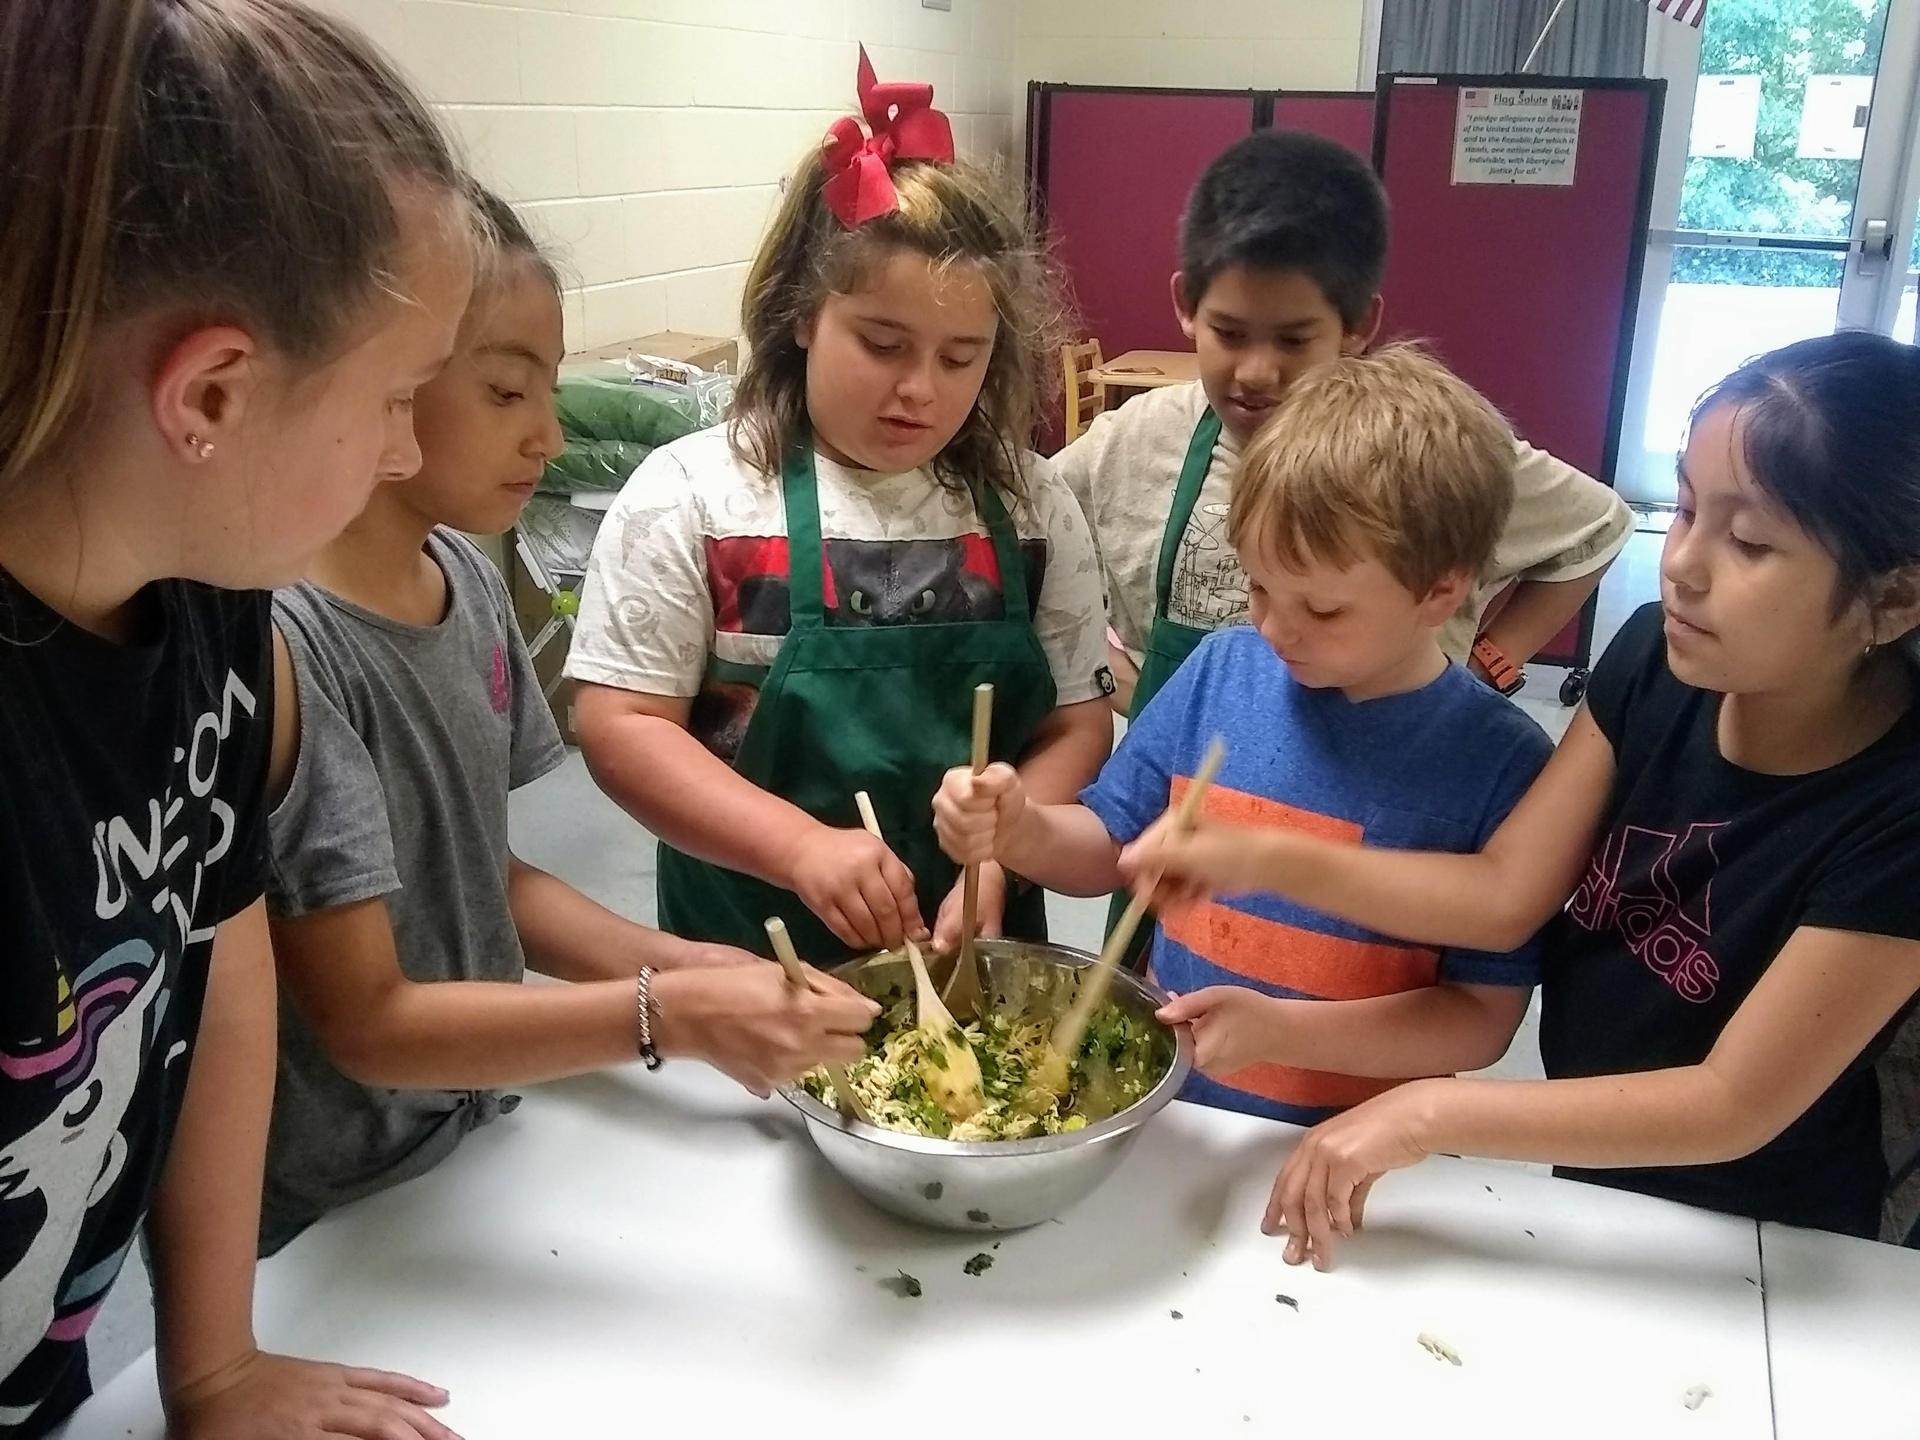 kids mixing salad